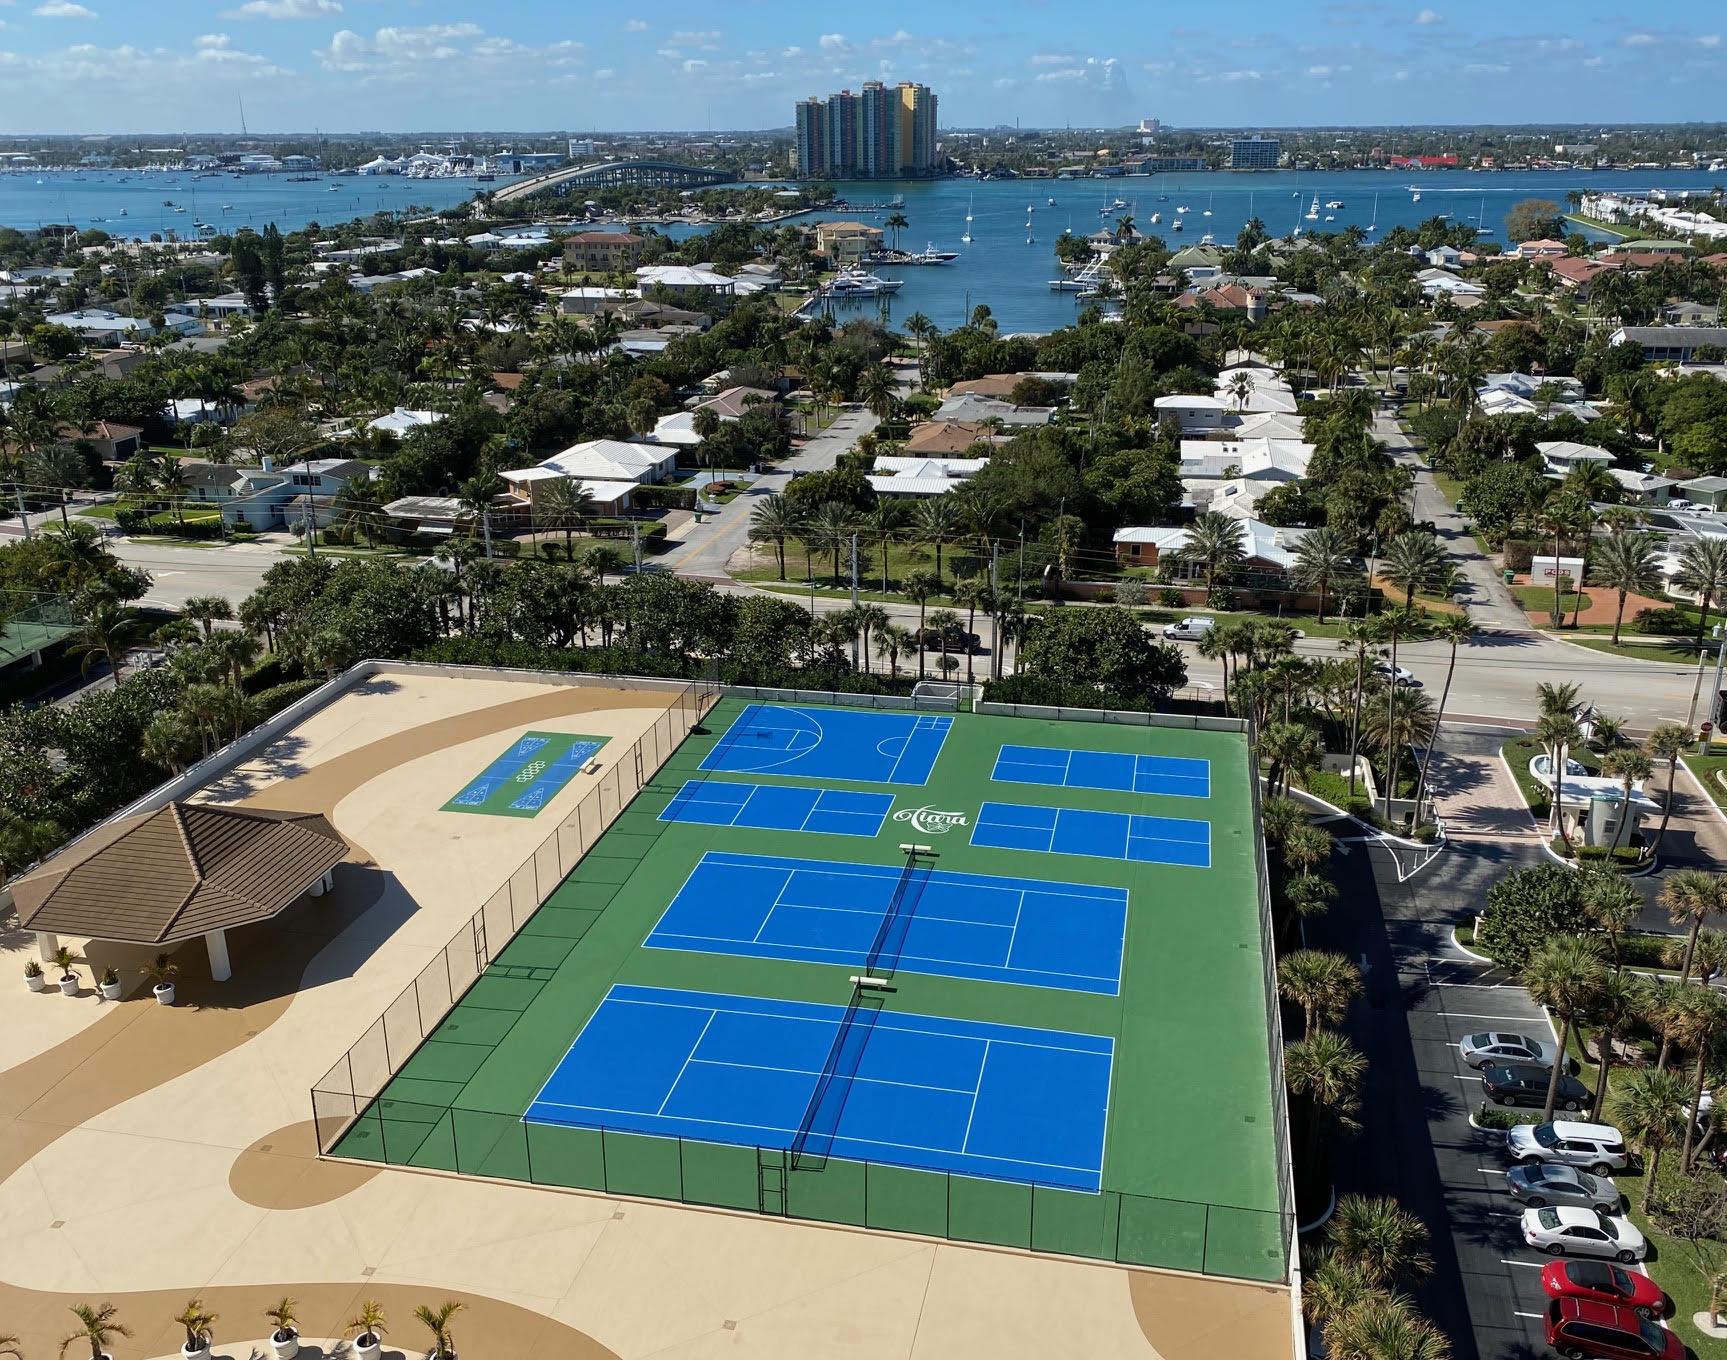 30 Tennis Courts